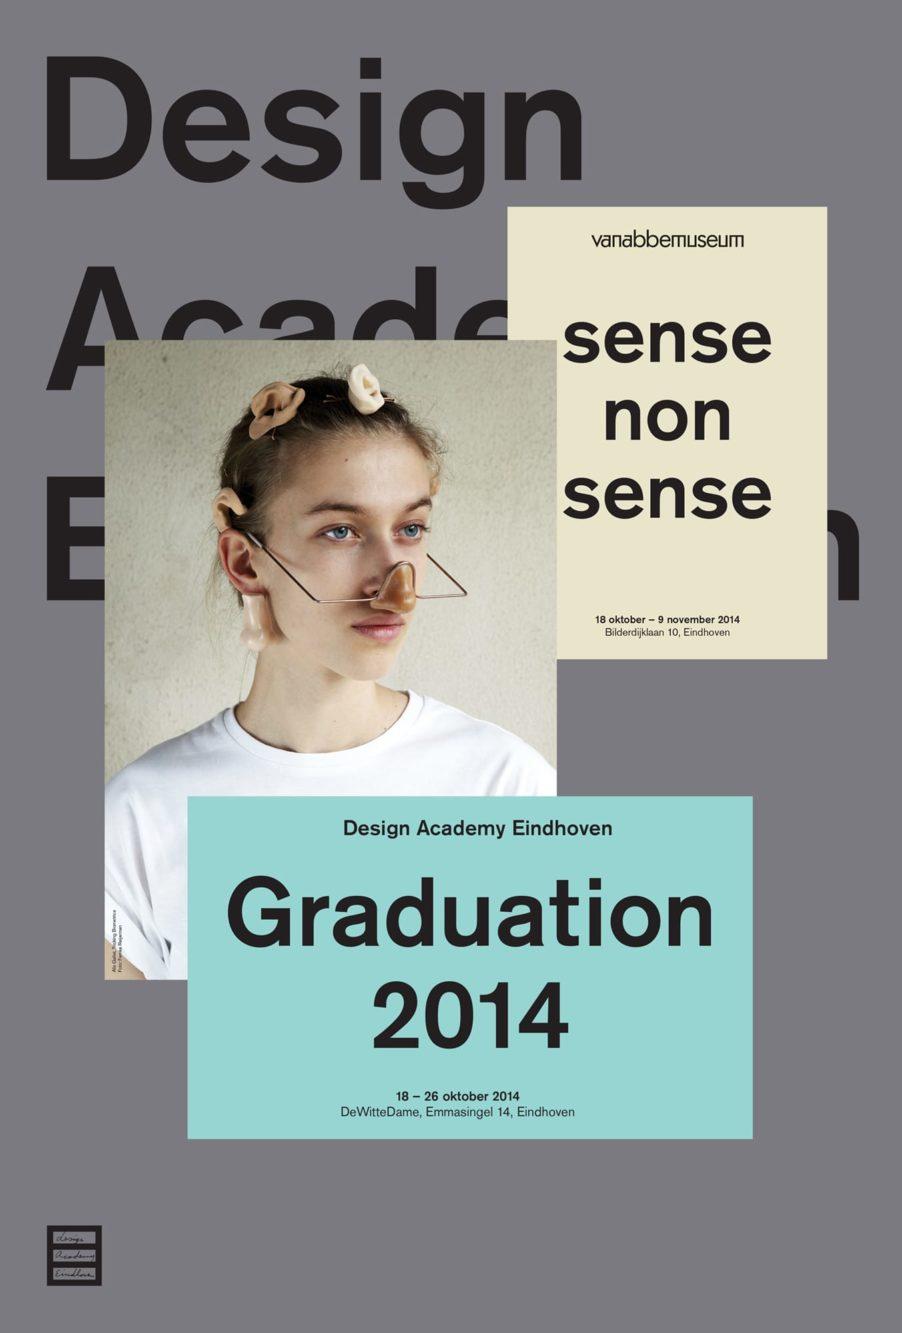 Haller Brun Design Academy Eindhoven Graduation Show DAE 2014 signage visual identity sense nonsense poster